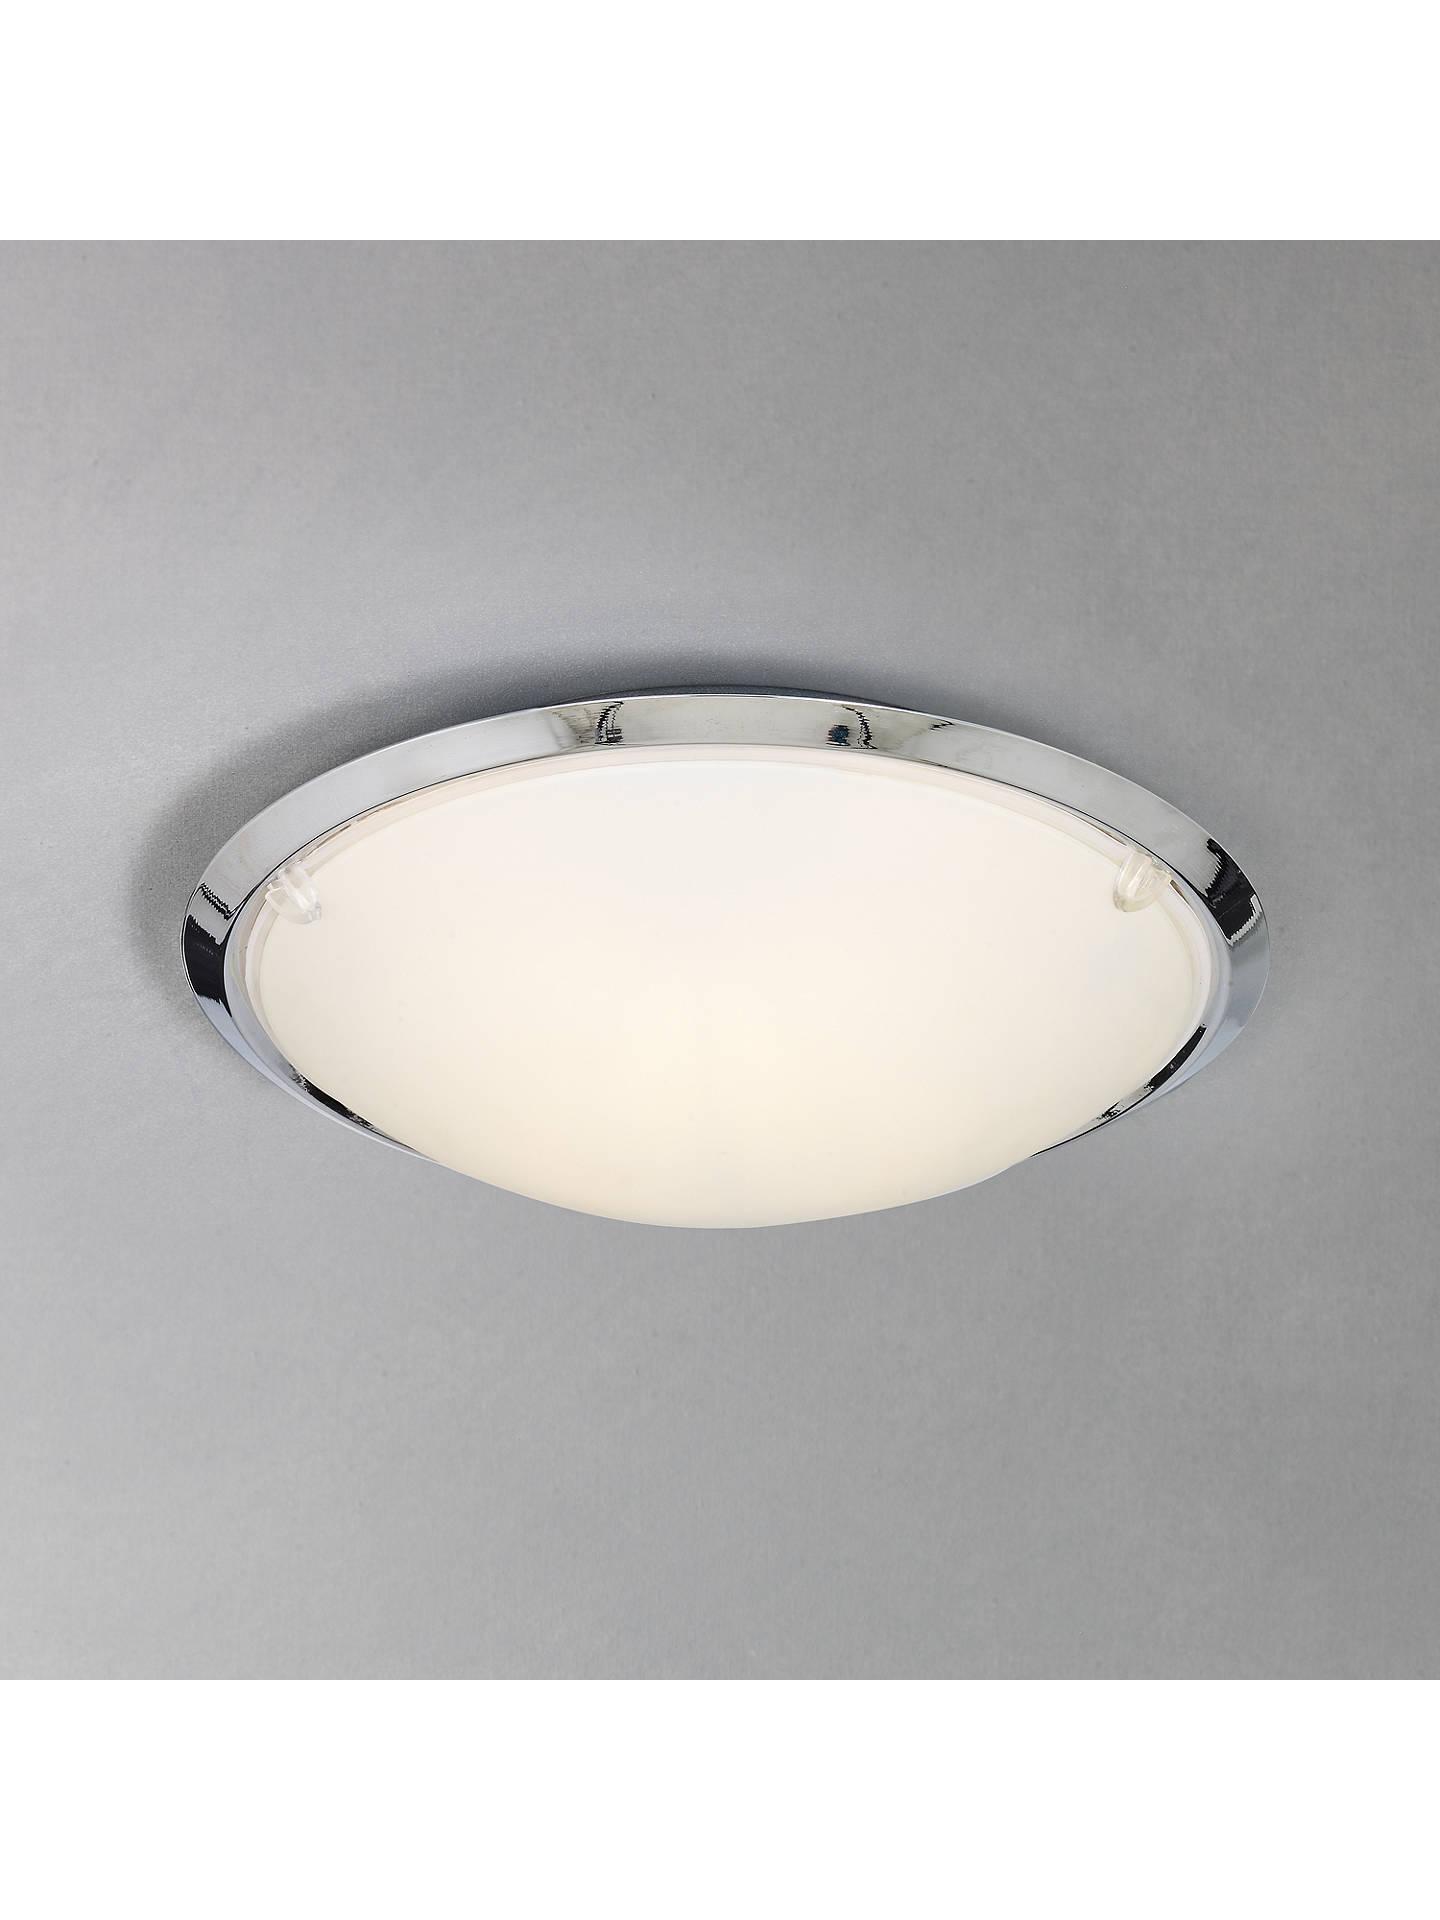 John Lewis The Basics Kennedy Bathroom Light At